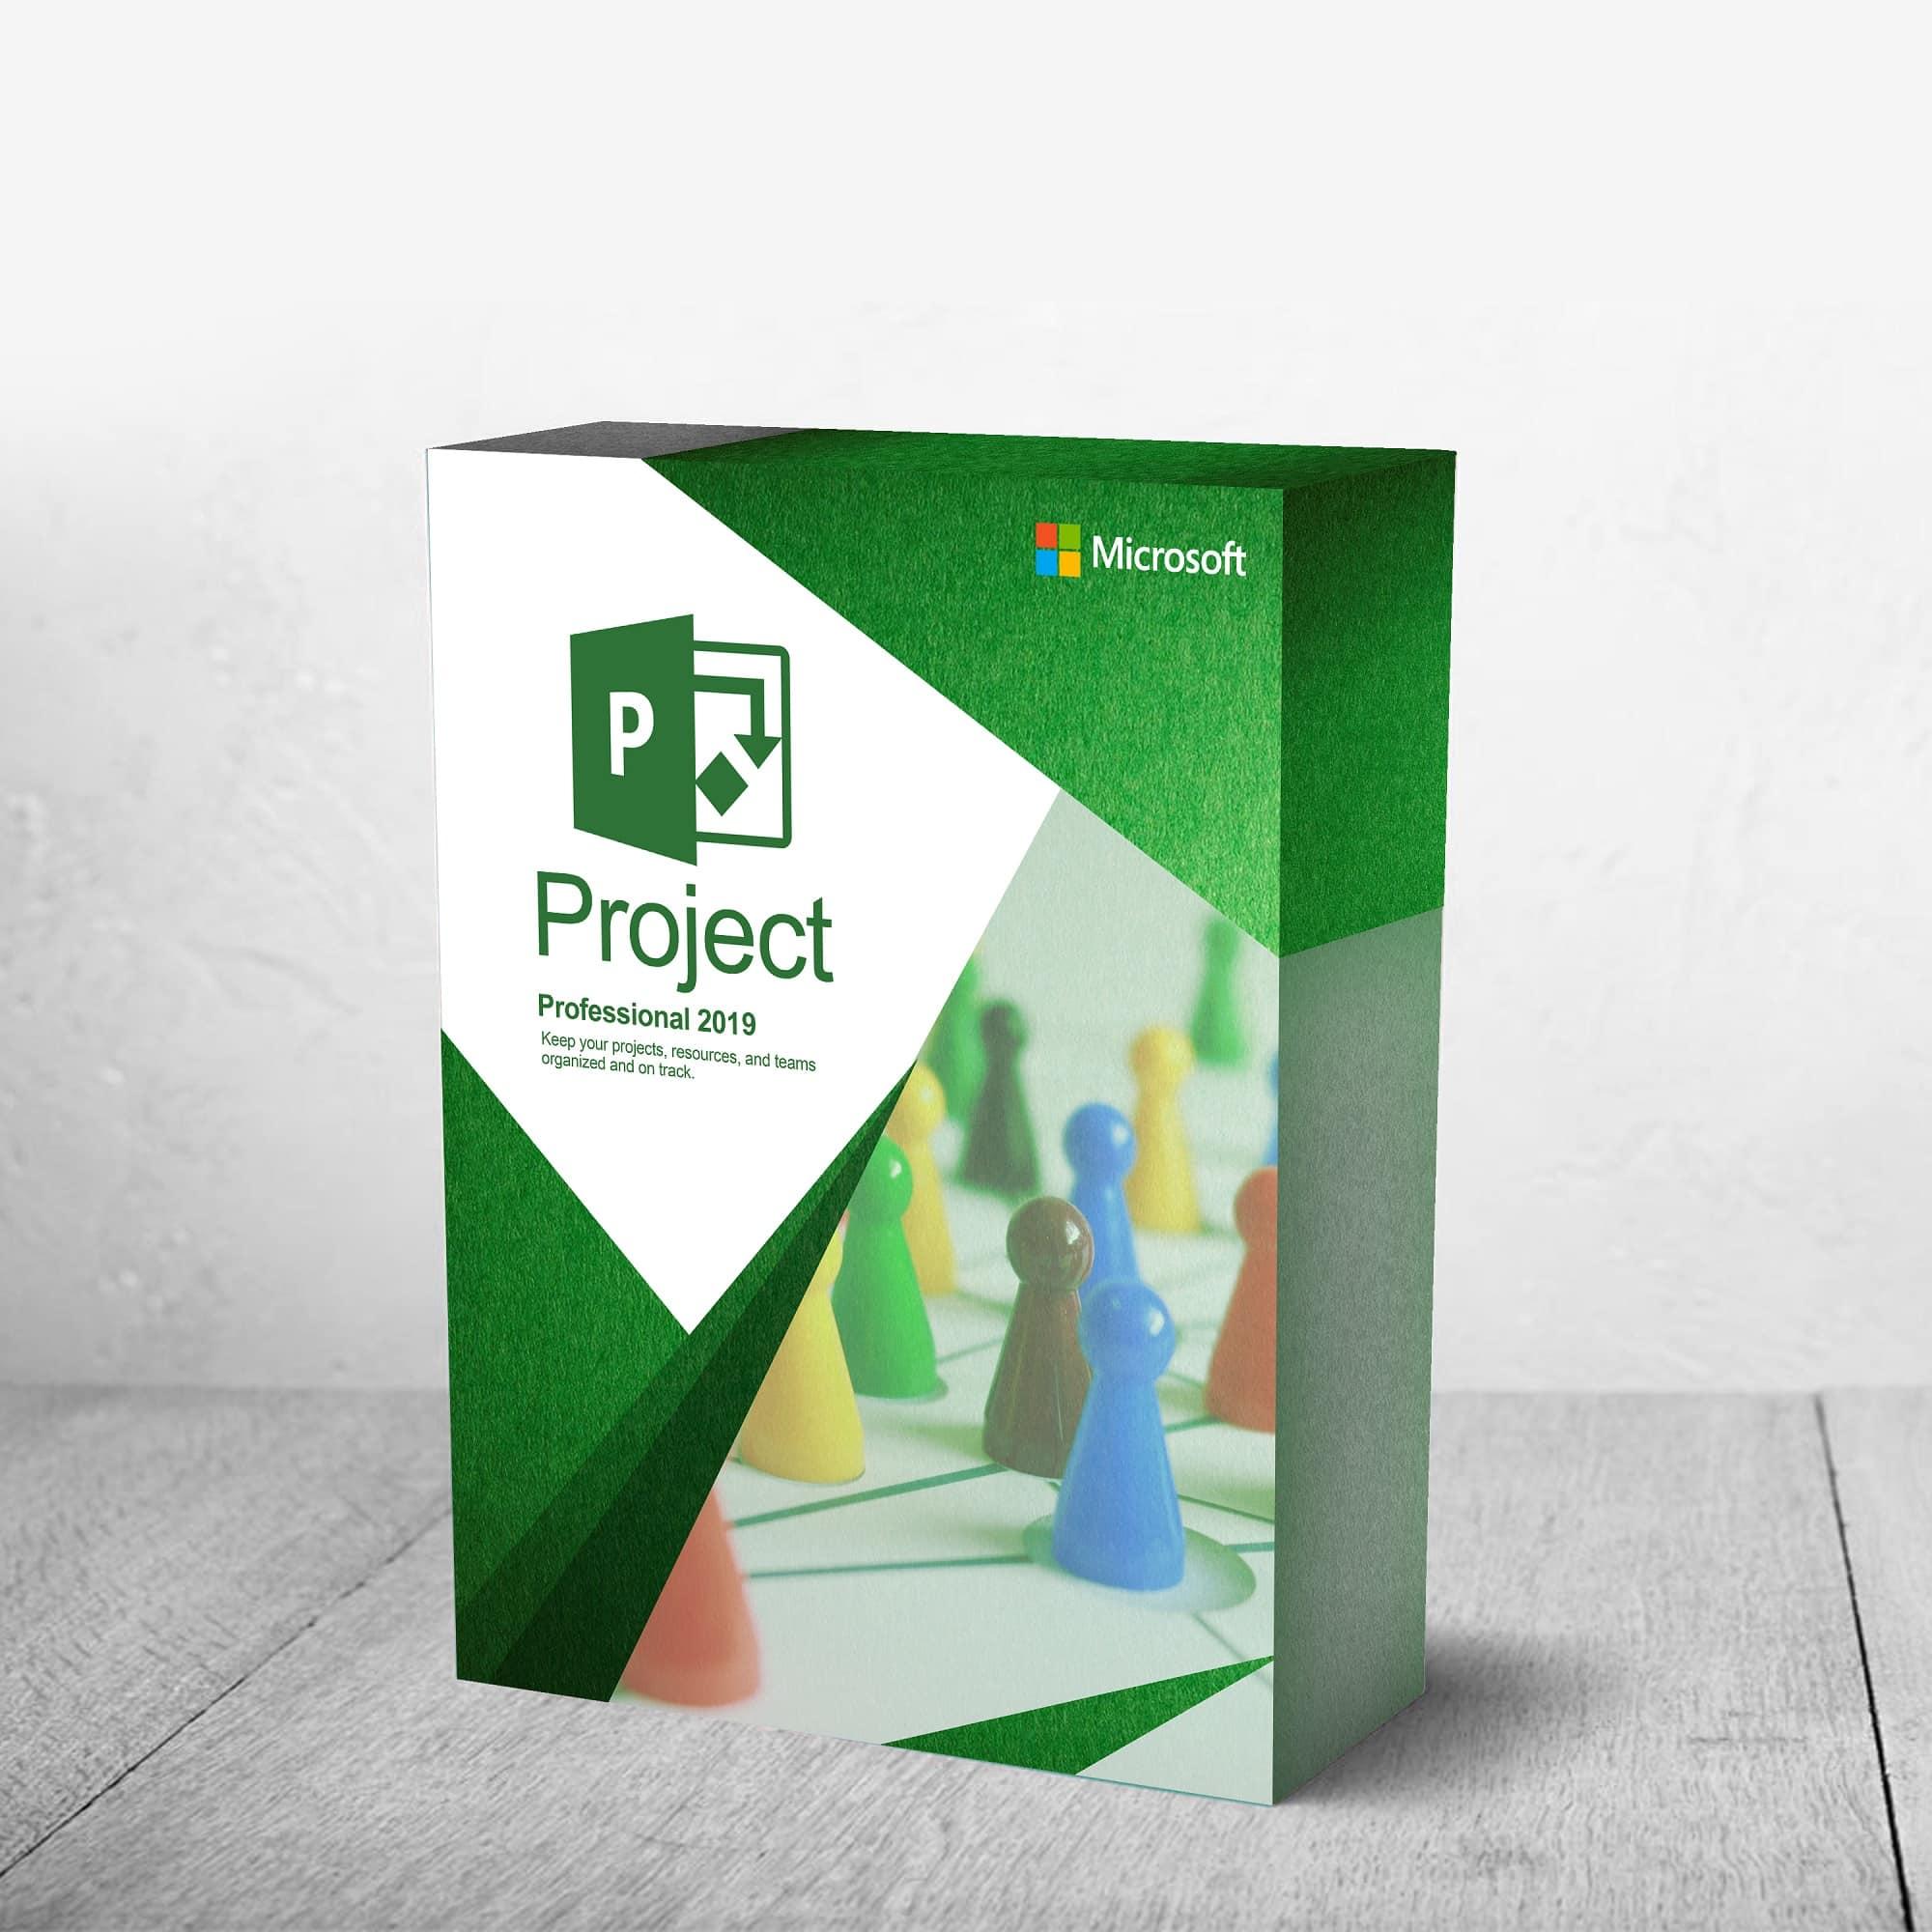 Microsoft Project 2019 Professional 1 Pc Product Key Code Download Refurb Stuff4pc